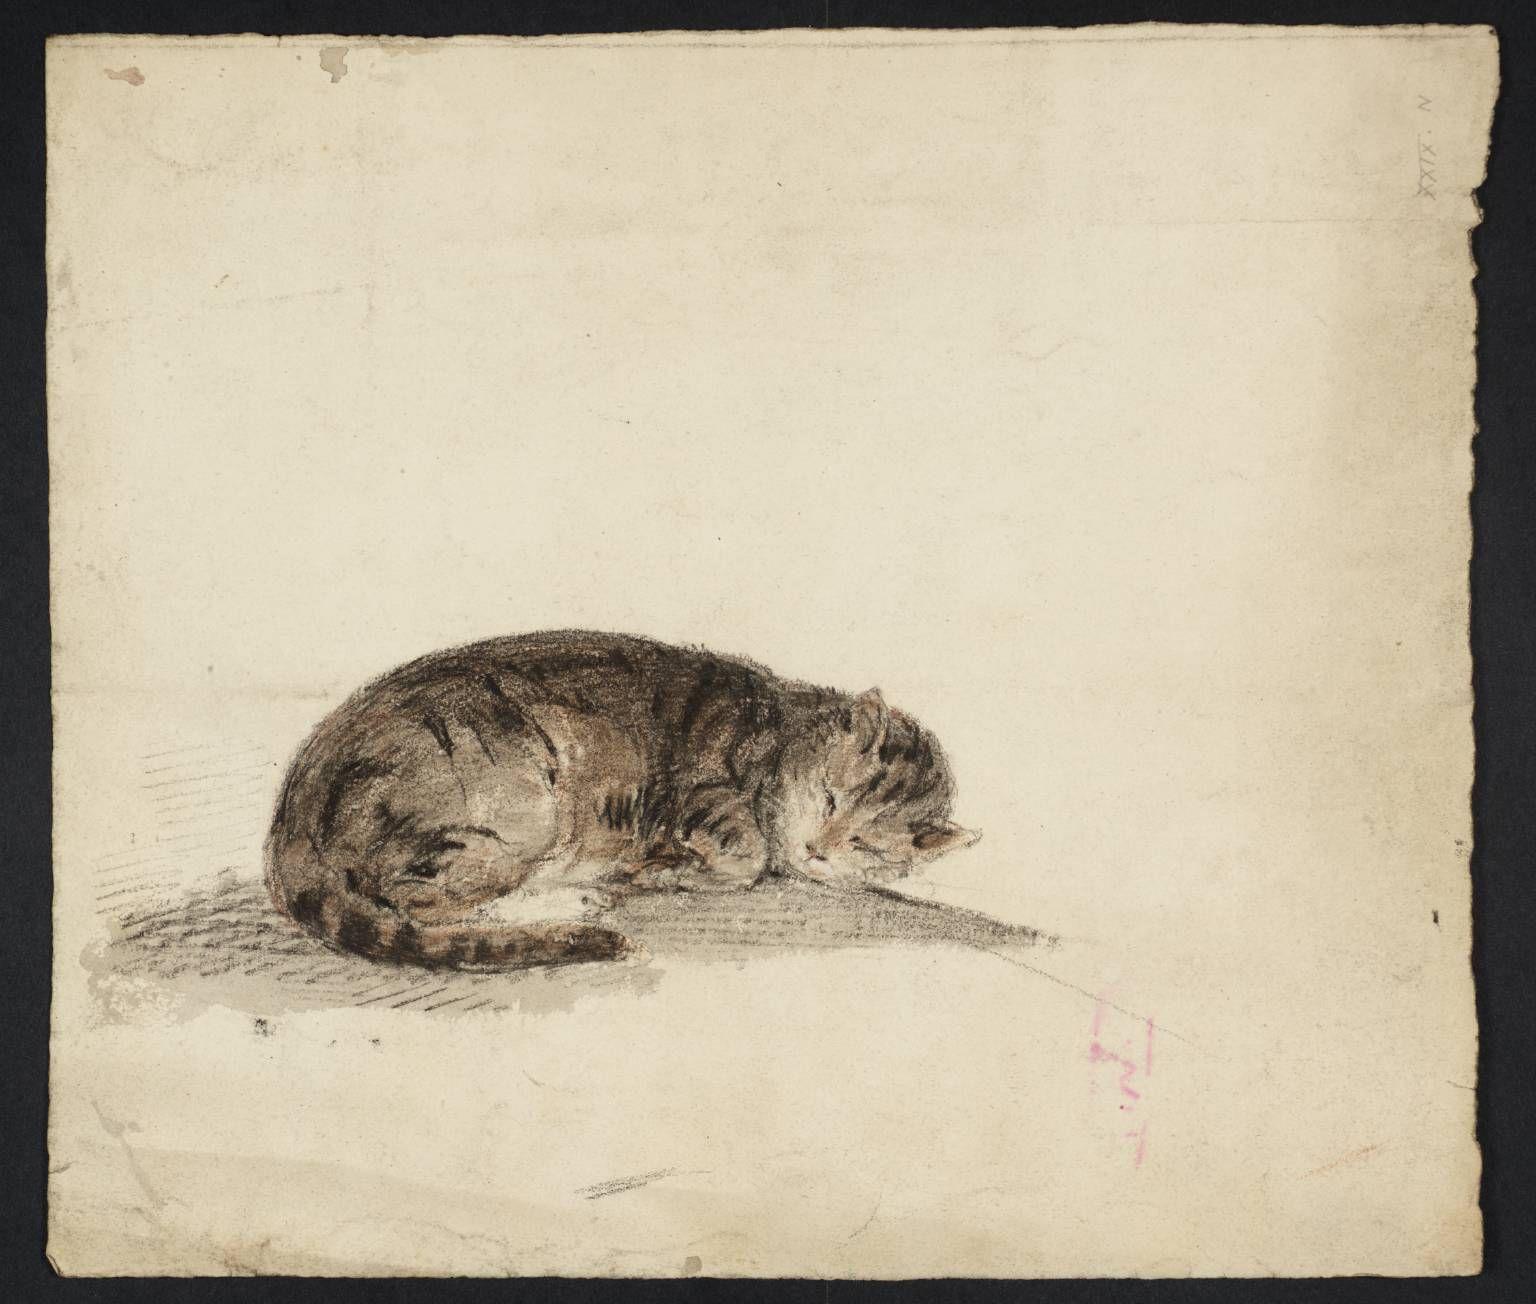 Gwen John 1876-1936 British Cats In Art-20th Century Great Cat